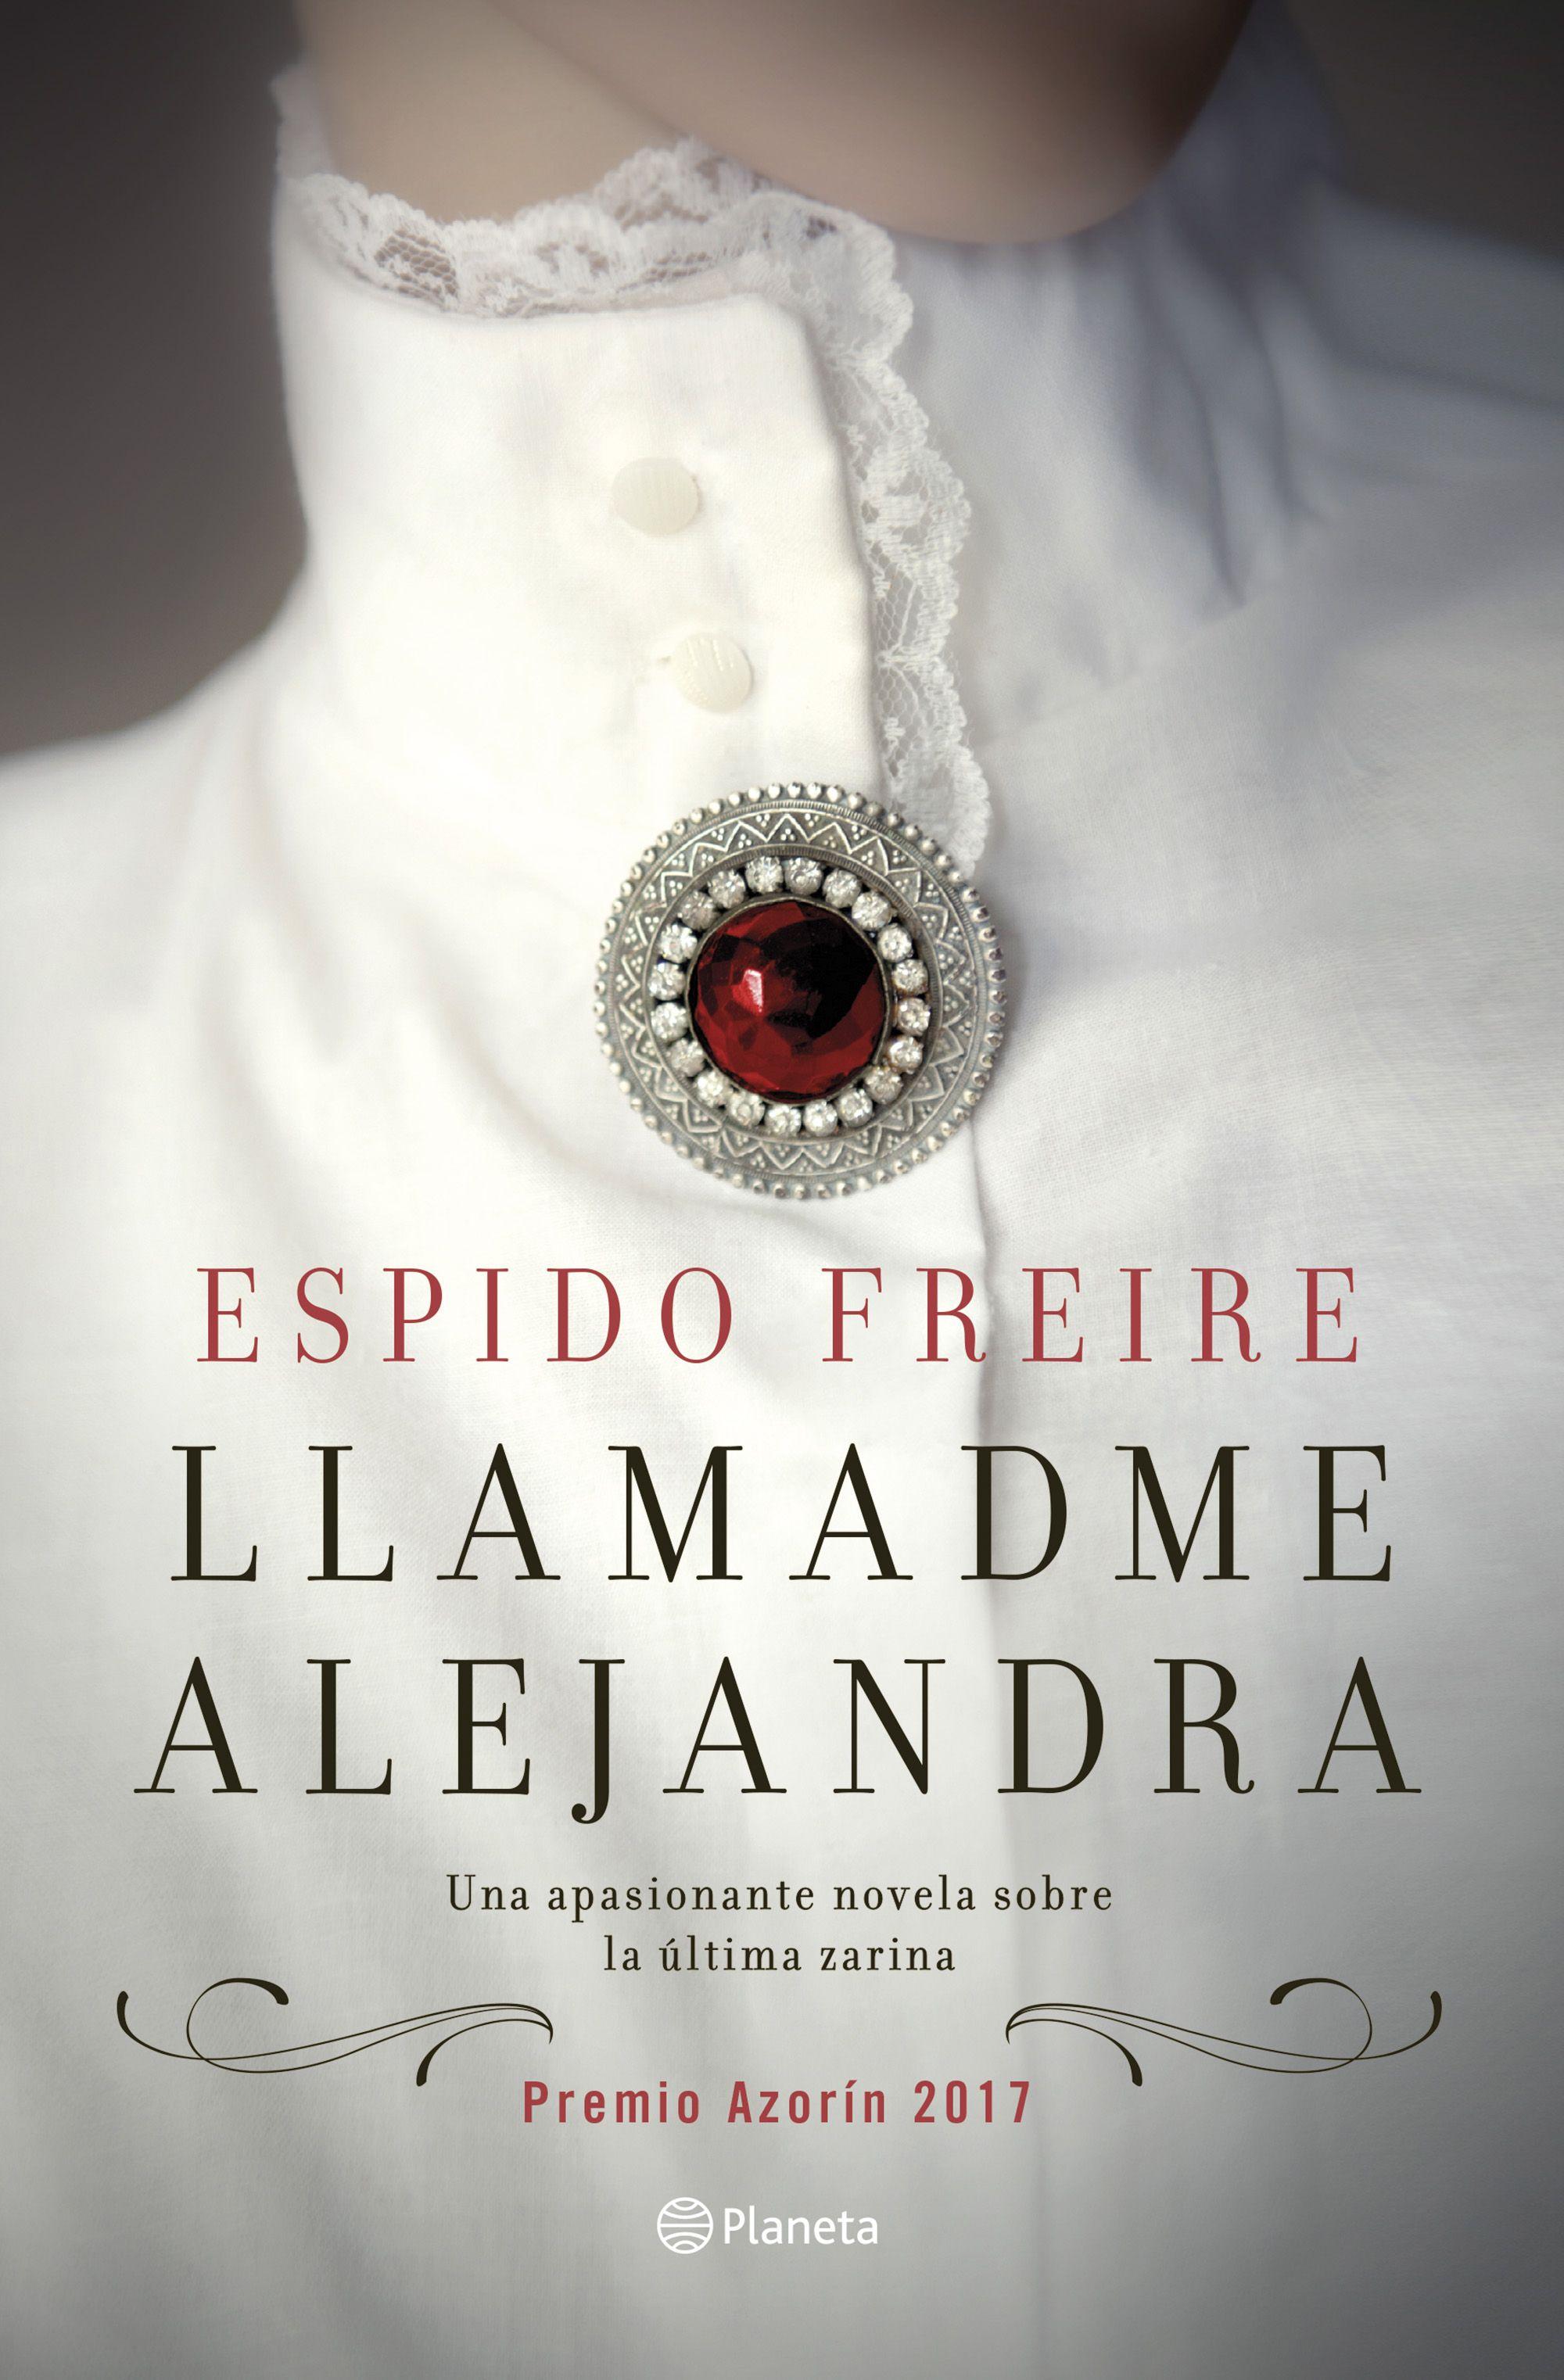 llamadme-alejandra-espido-freire.jpg